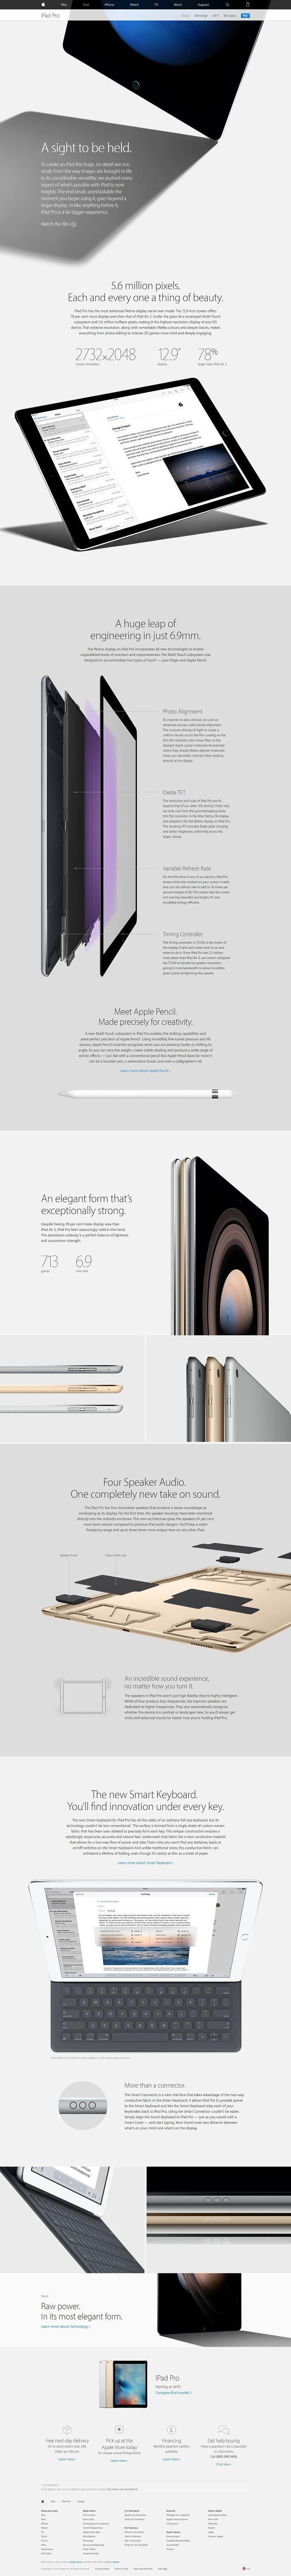 Apple iPad Pro web design